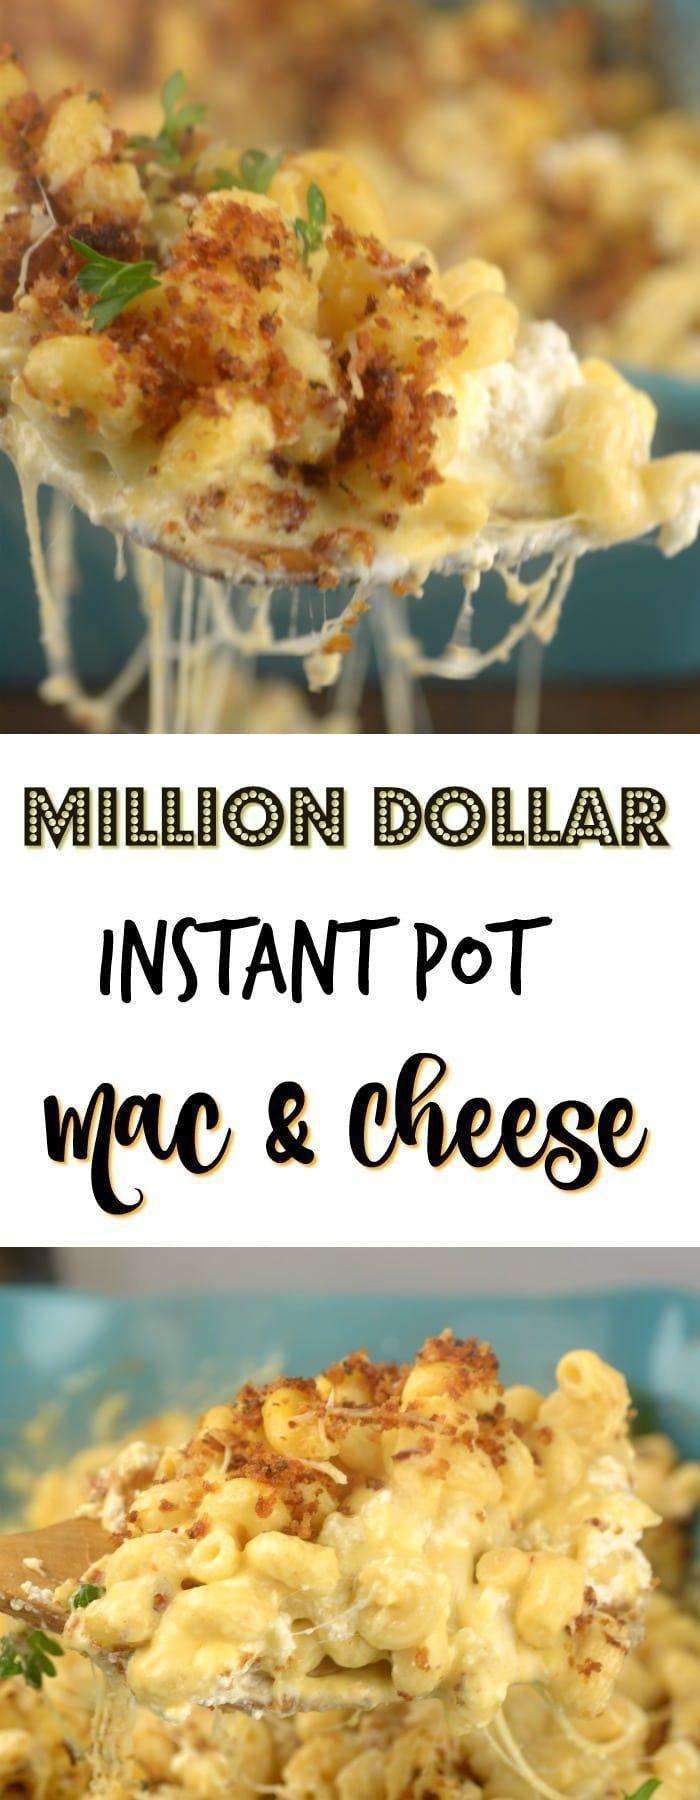 Million Dollar Instant Pot Mac and Cheese #instantpotrecipes Million Dollar Instant Pot Mac and Cheese #macandcheeserecipe